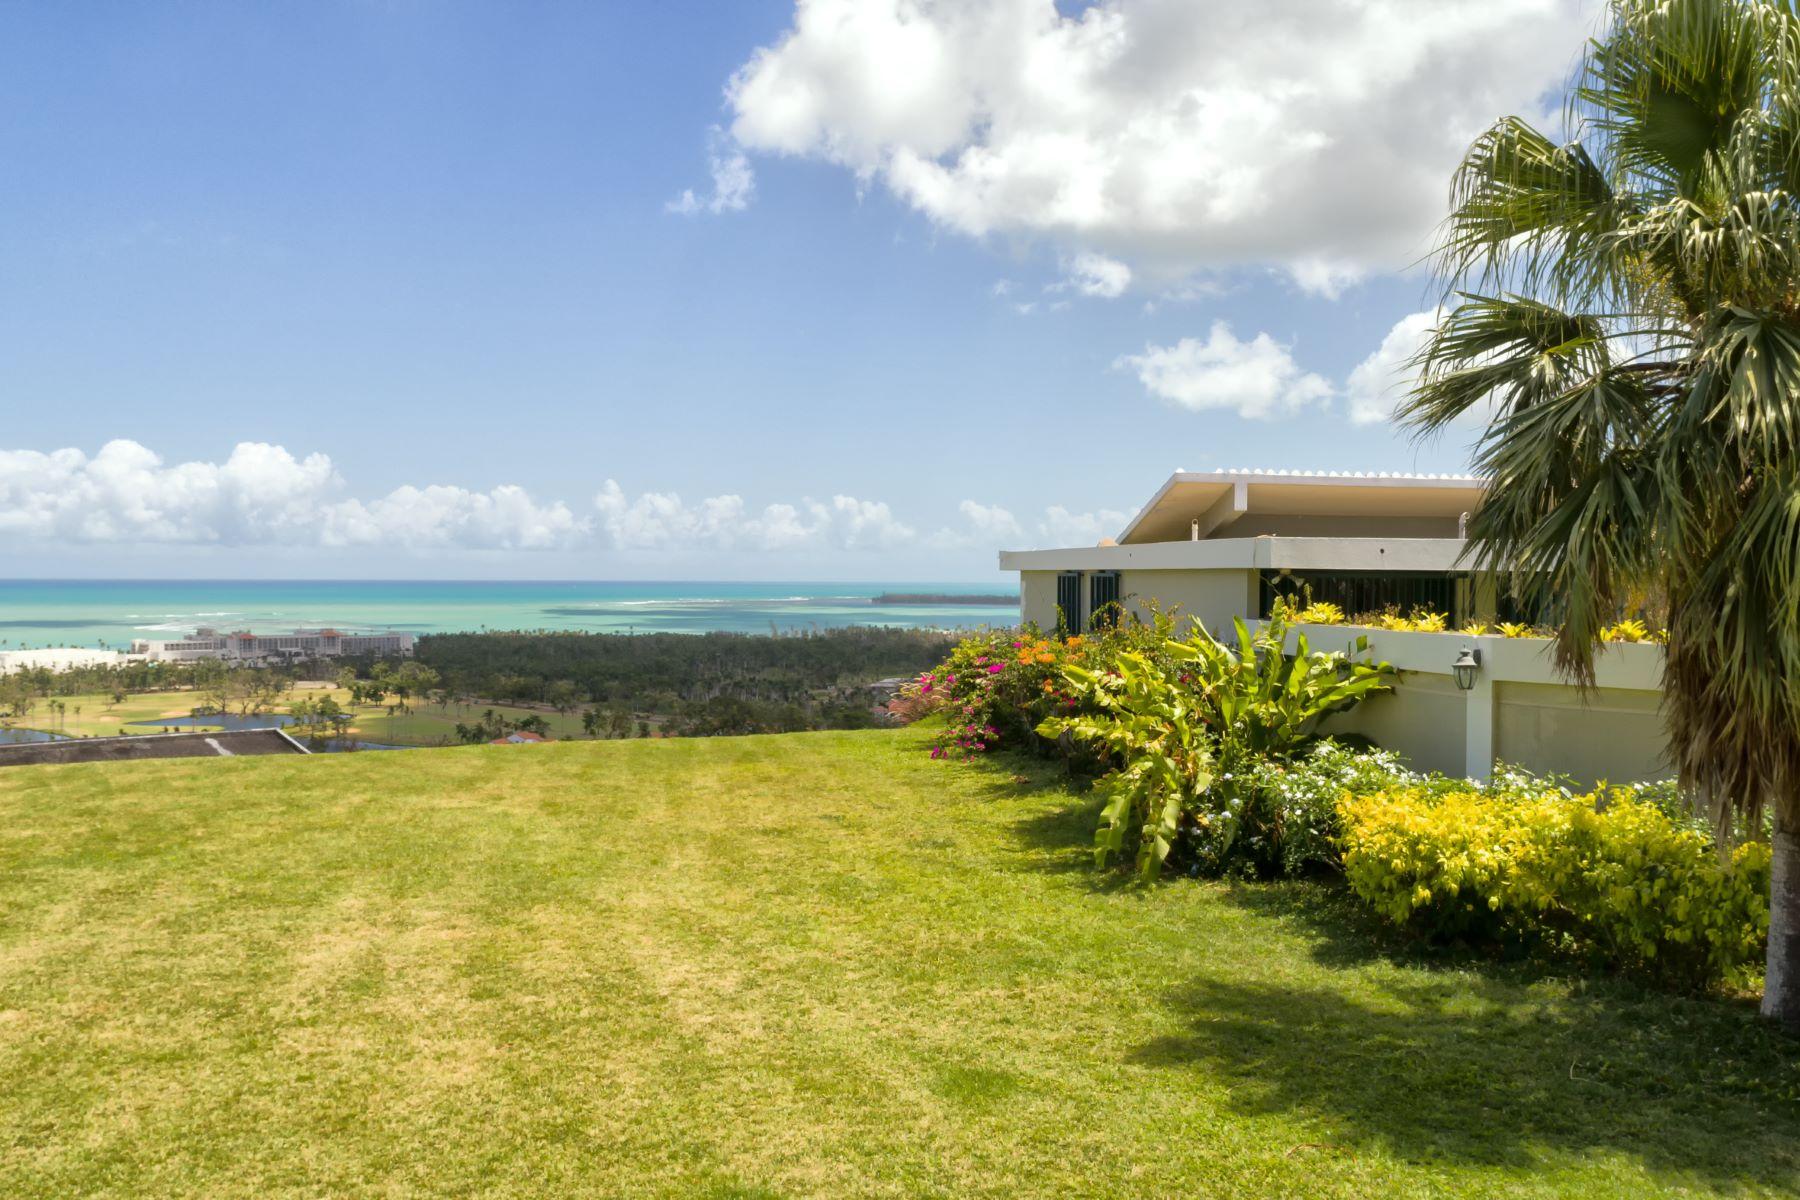 Additional photo for property listing at Boundless Caribbean Seascape at Hacienda del Mar Carr. 968, Km 1.2 Rio Grande, Puerto Rico 00745 Puerto Rico